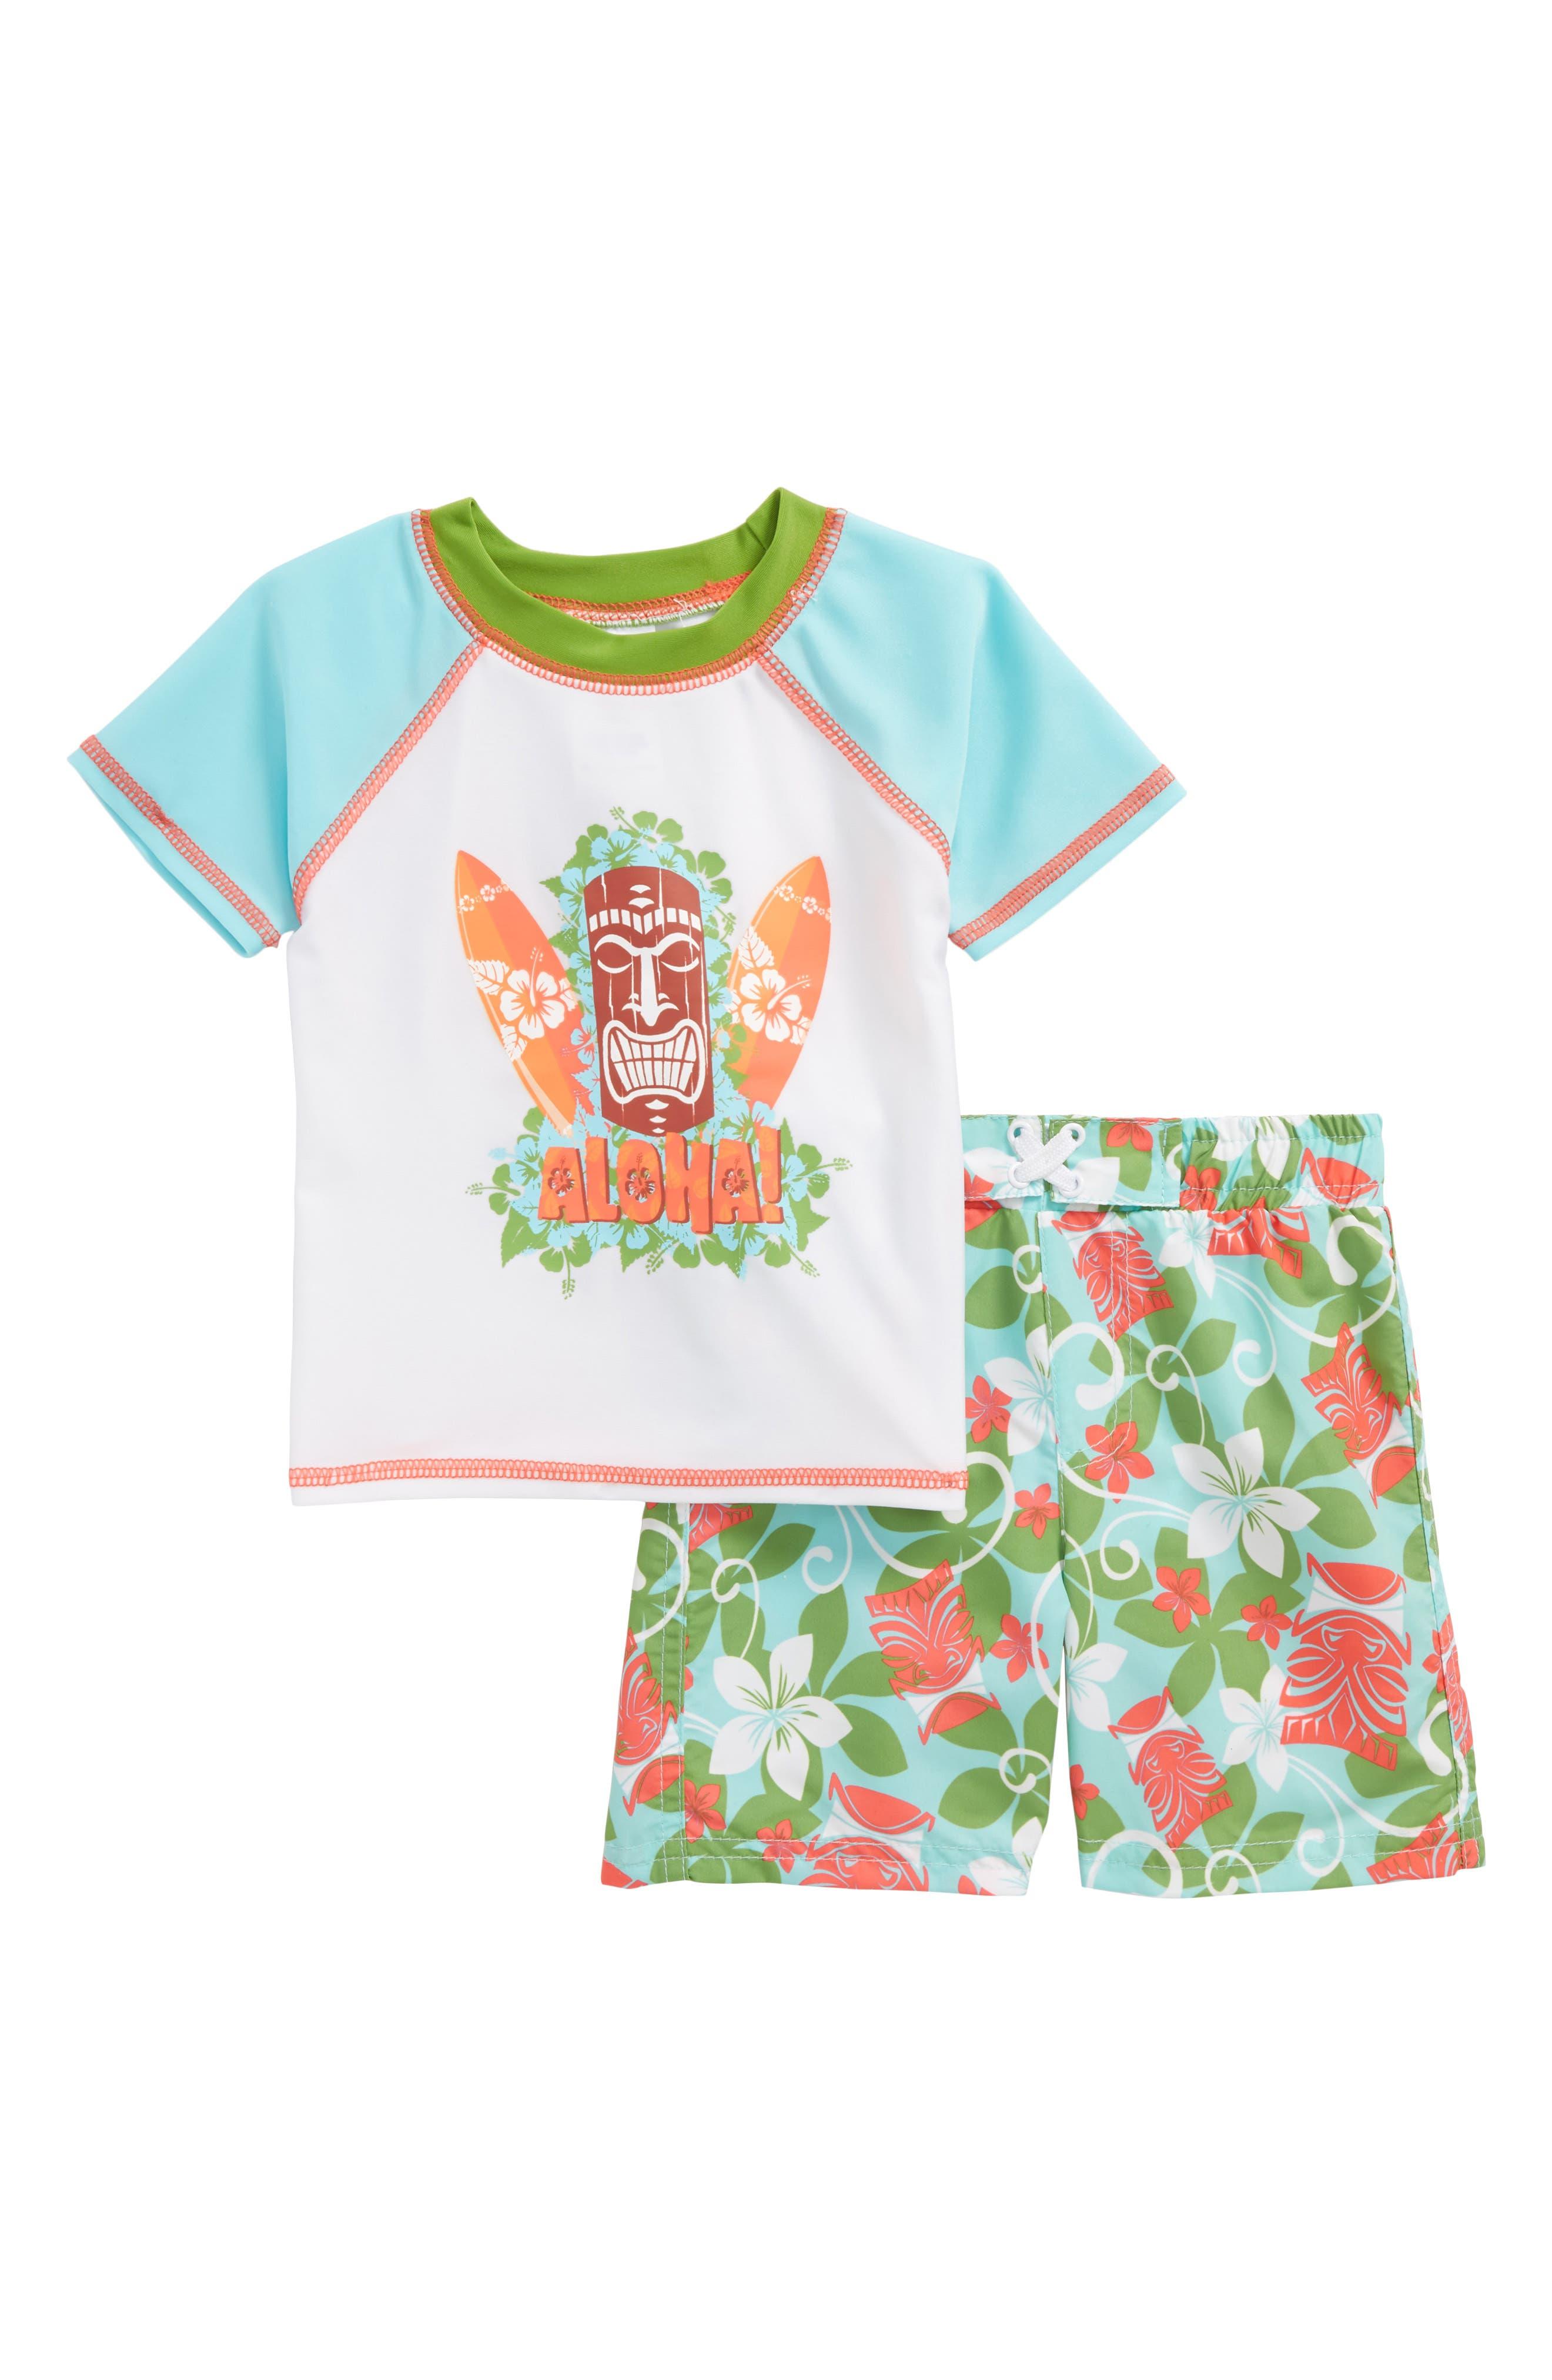 Aloha Tiki Two-Piece Rashguard Swimsuit,                         Main,                         color, 109